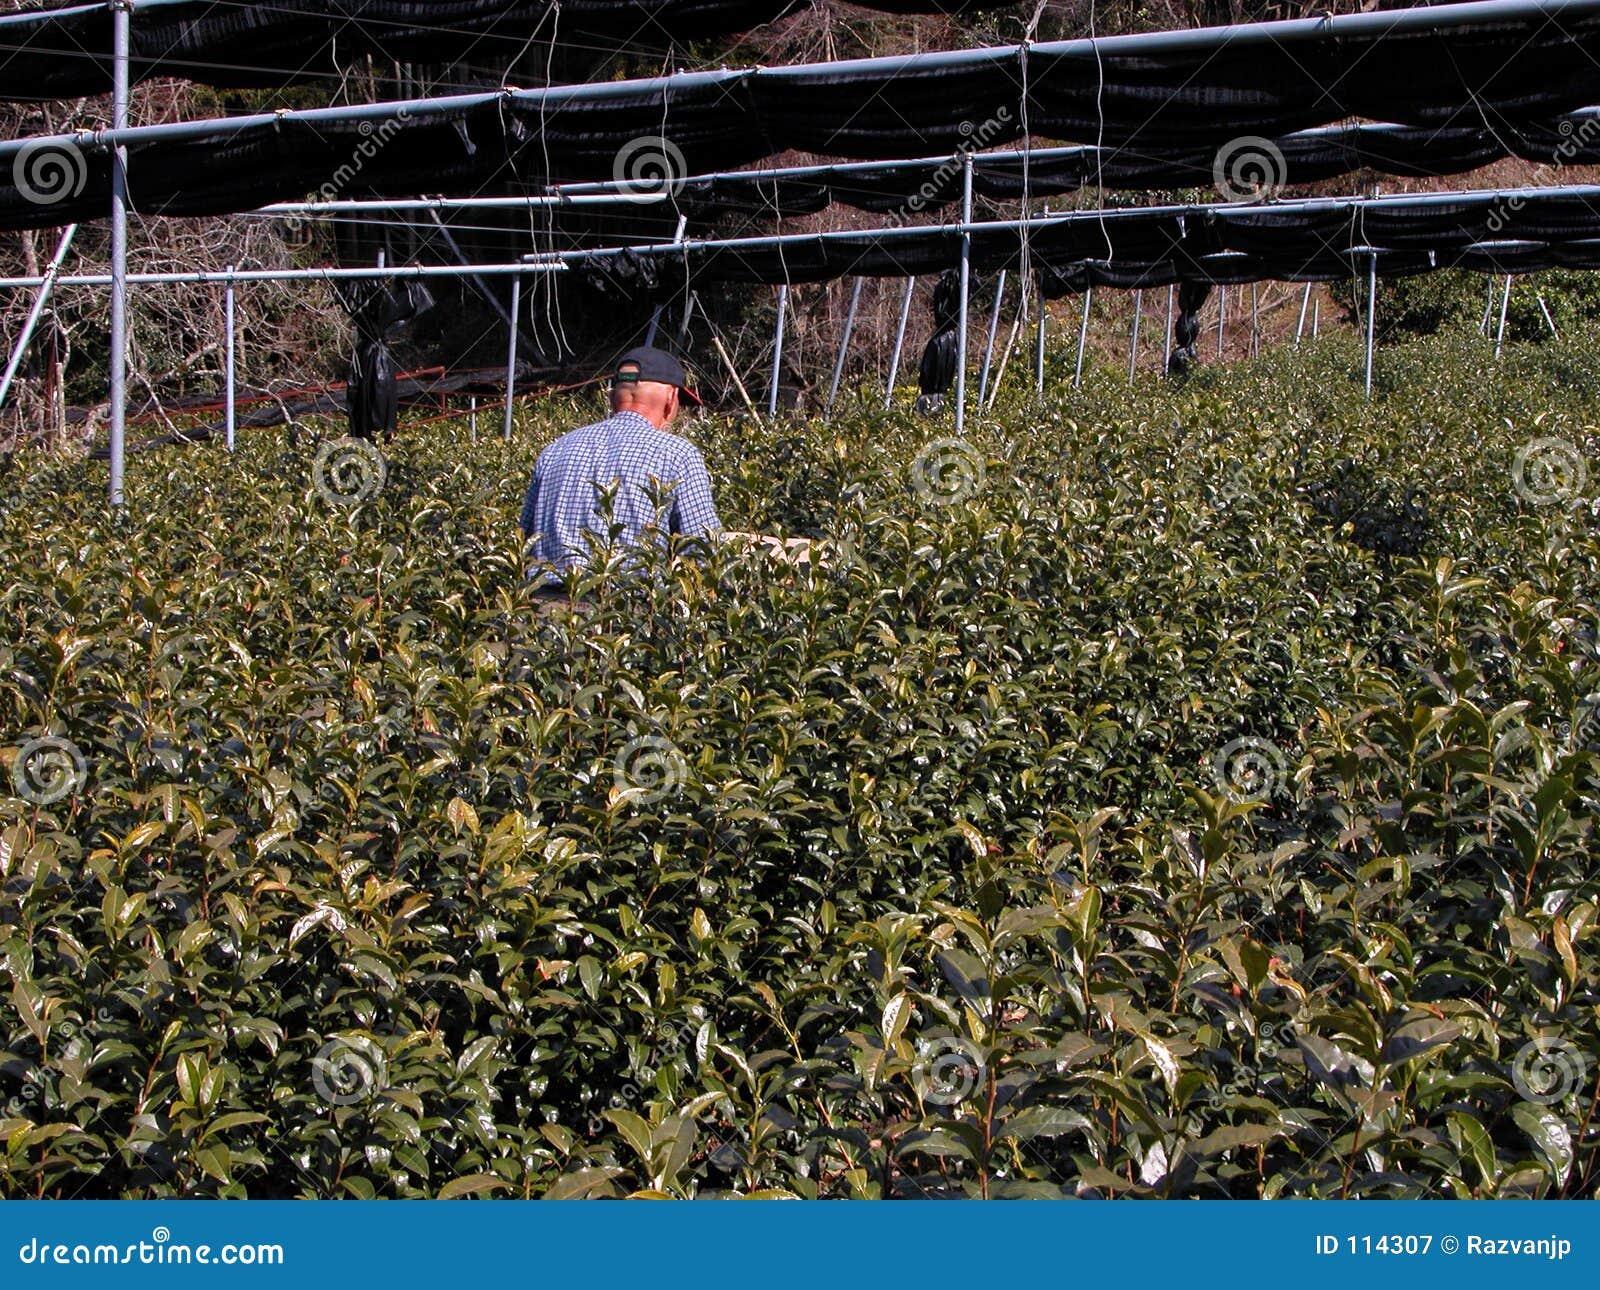 Fertilizing the tea culture